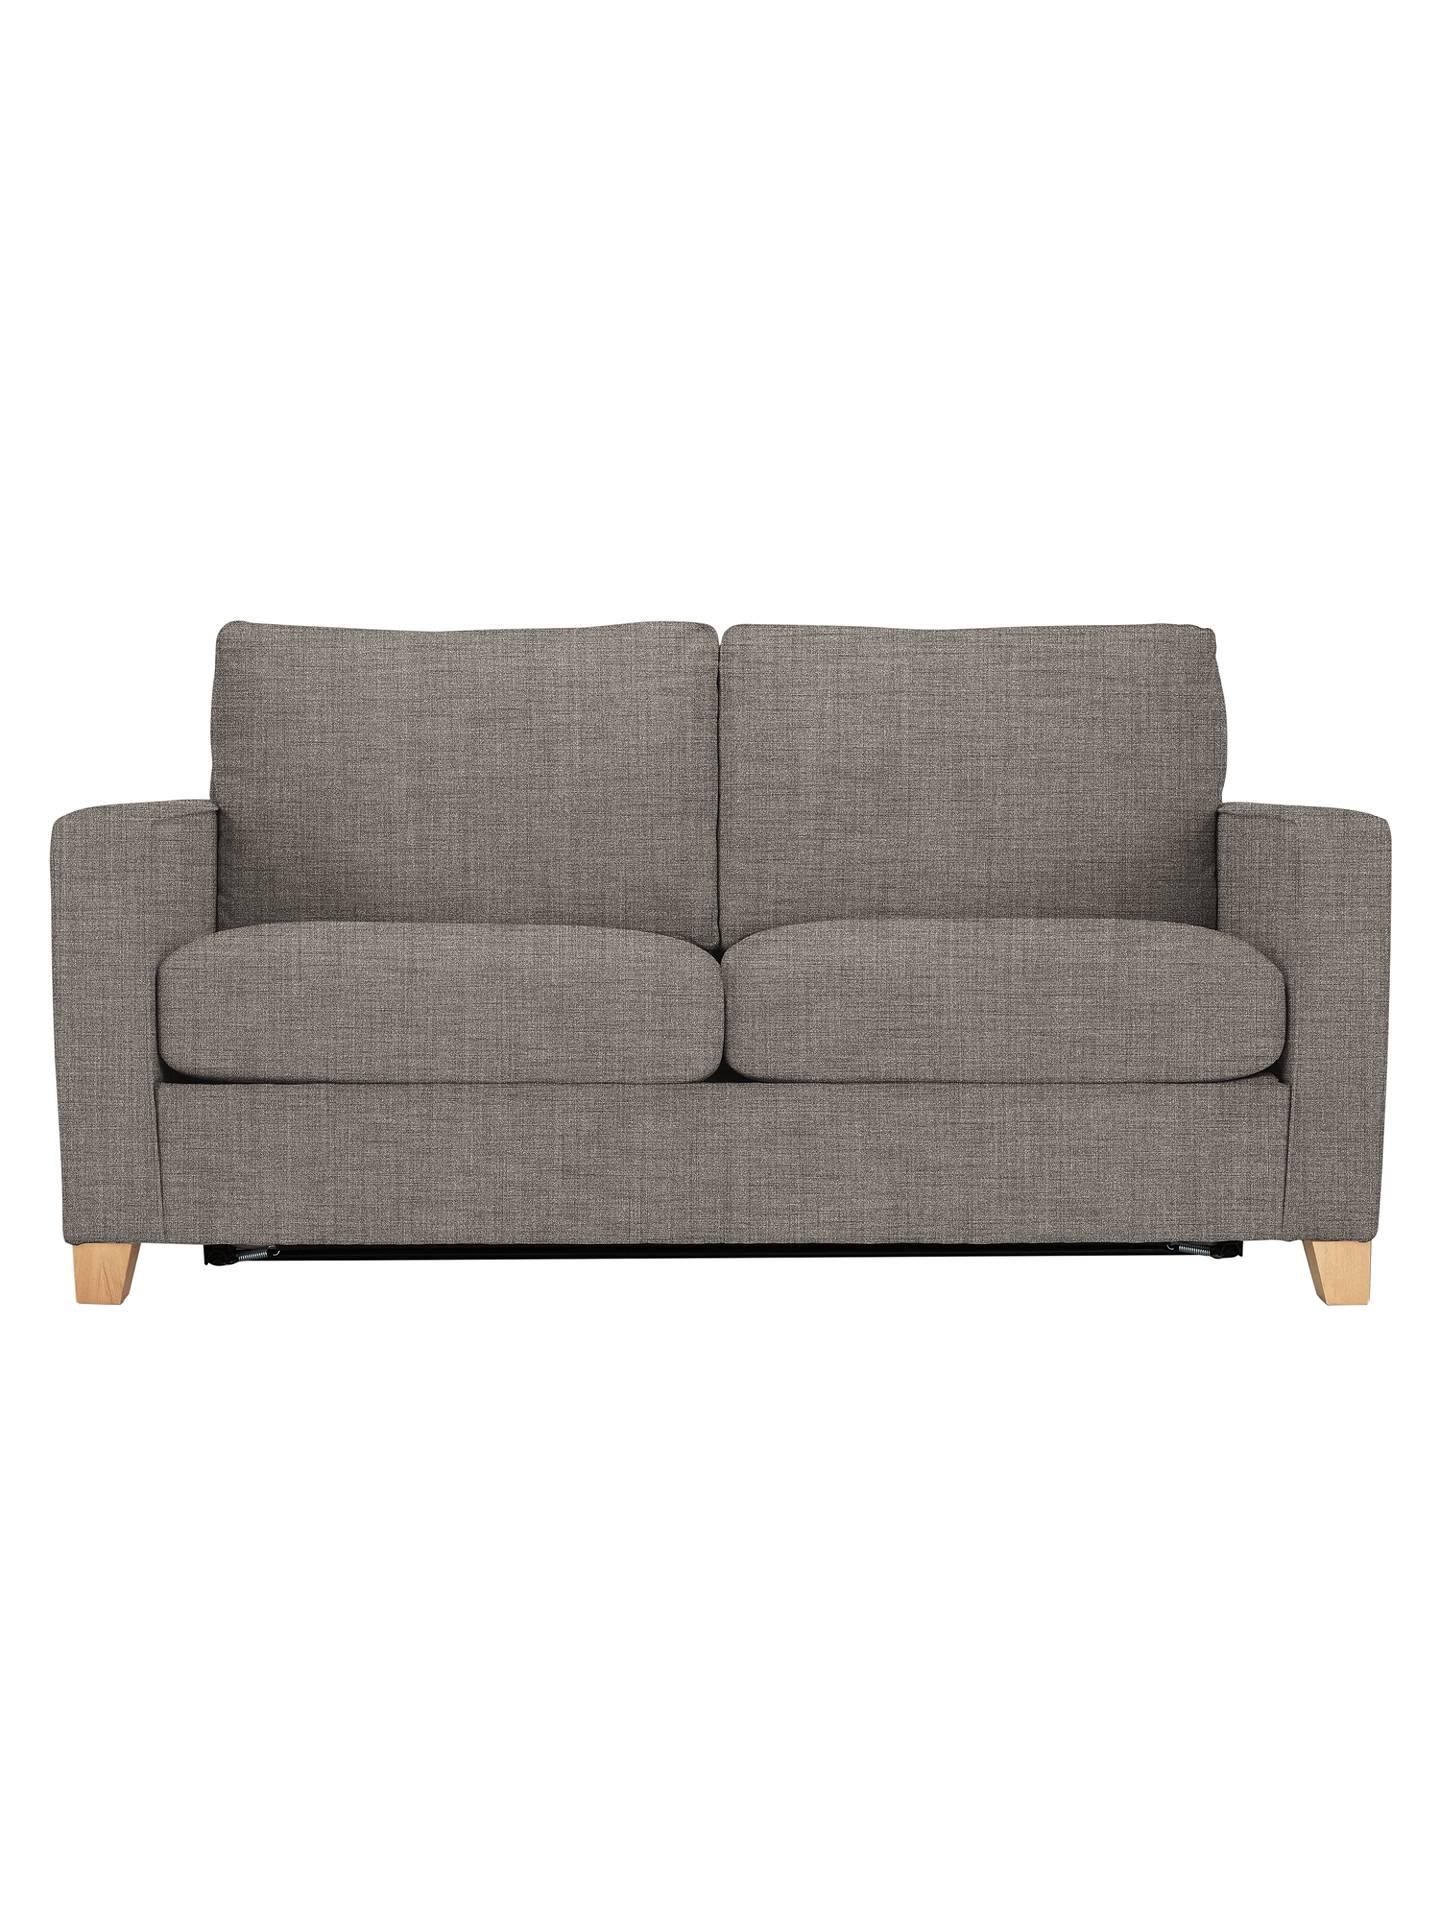 John Lewis The Basics Jackson Medium 2 Seater Sofa Bed Light Legs Hayden Silver